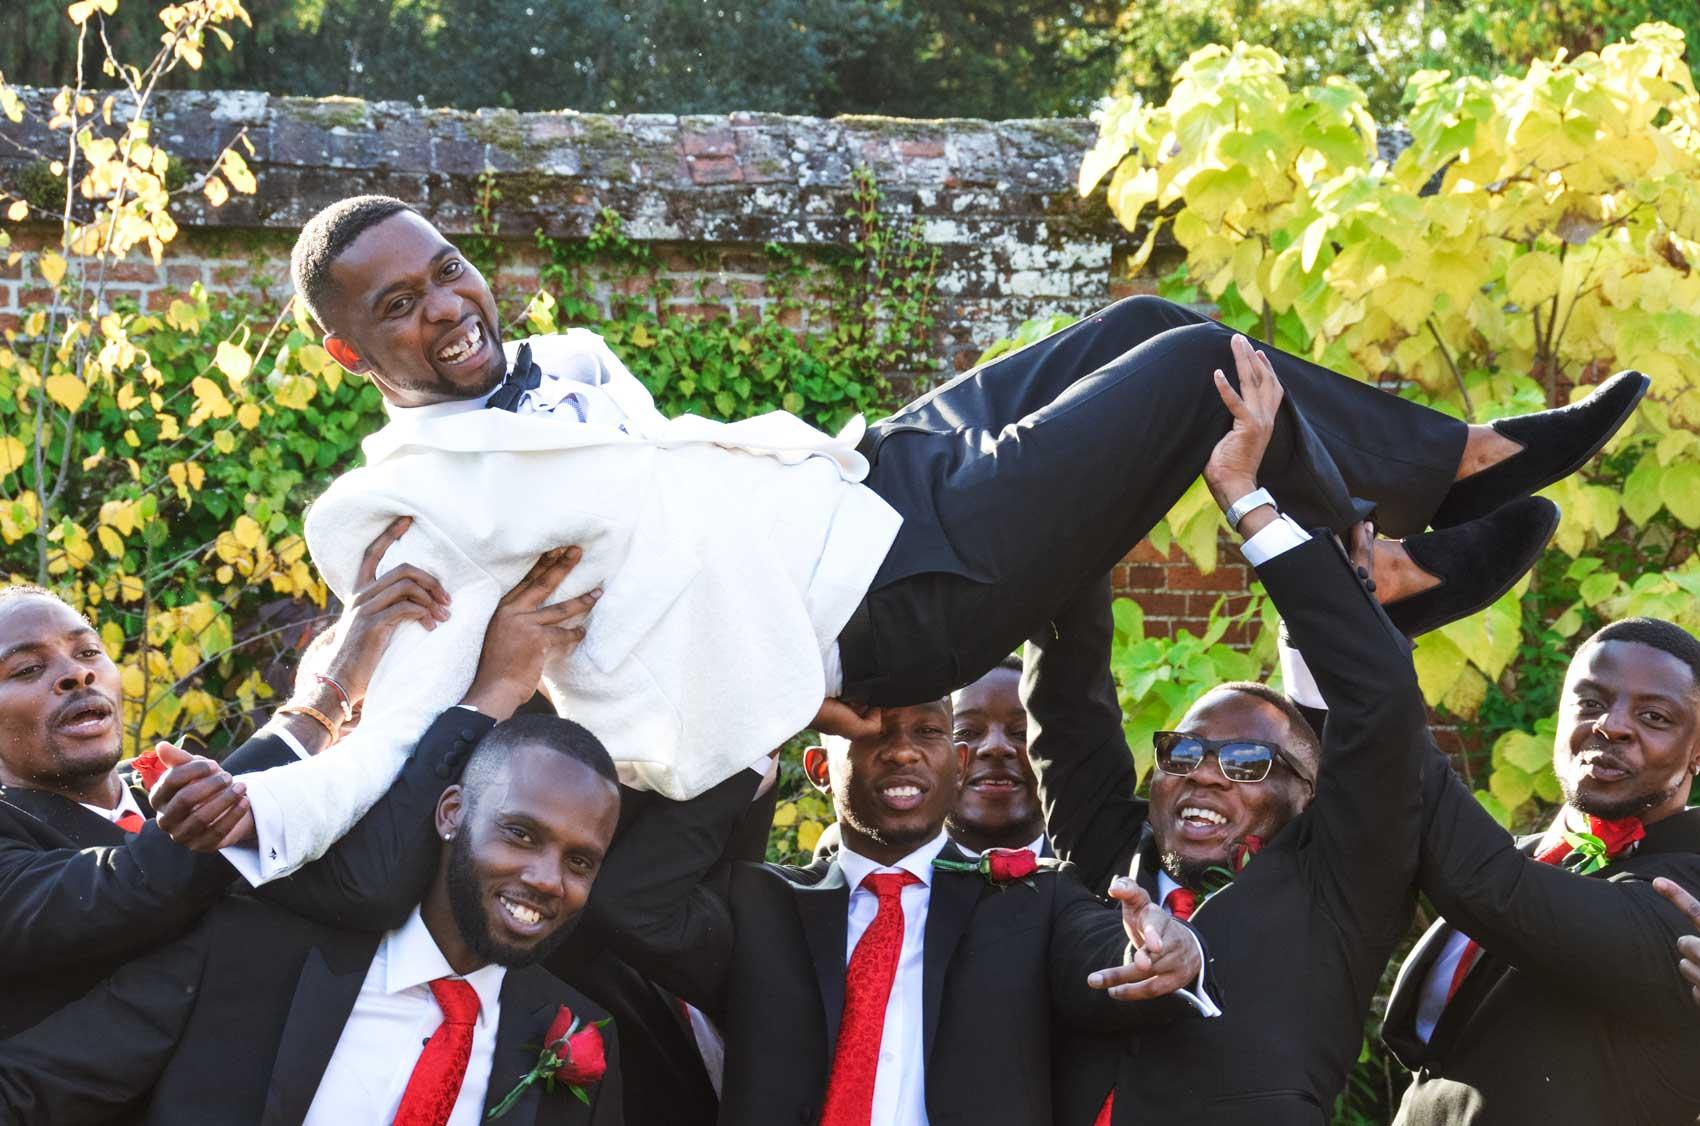 Wedding Photographers Painshill Conservatory